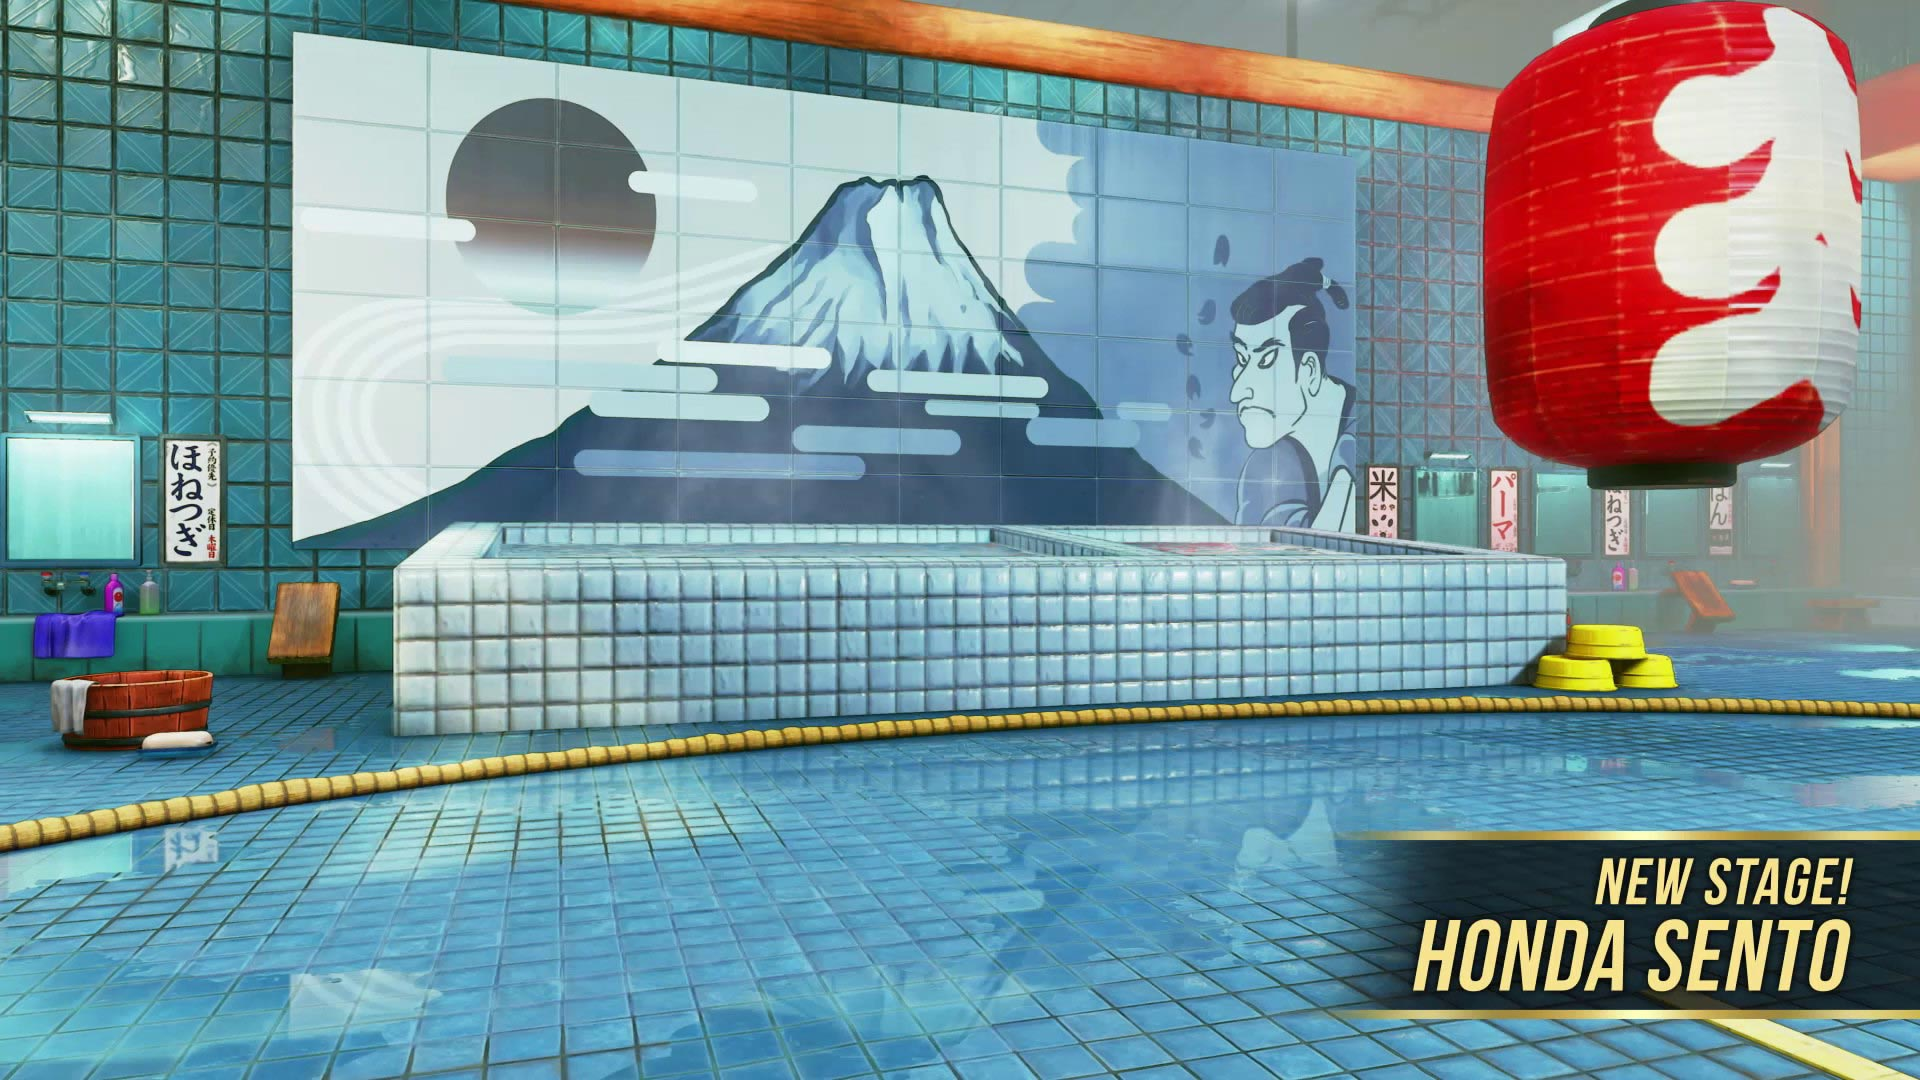 Street Fighter 5 Summer bundle DLC screenshots 5 out of 8 image gallery